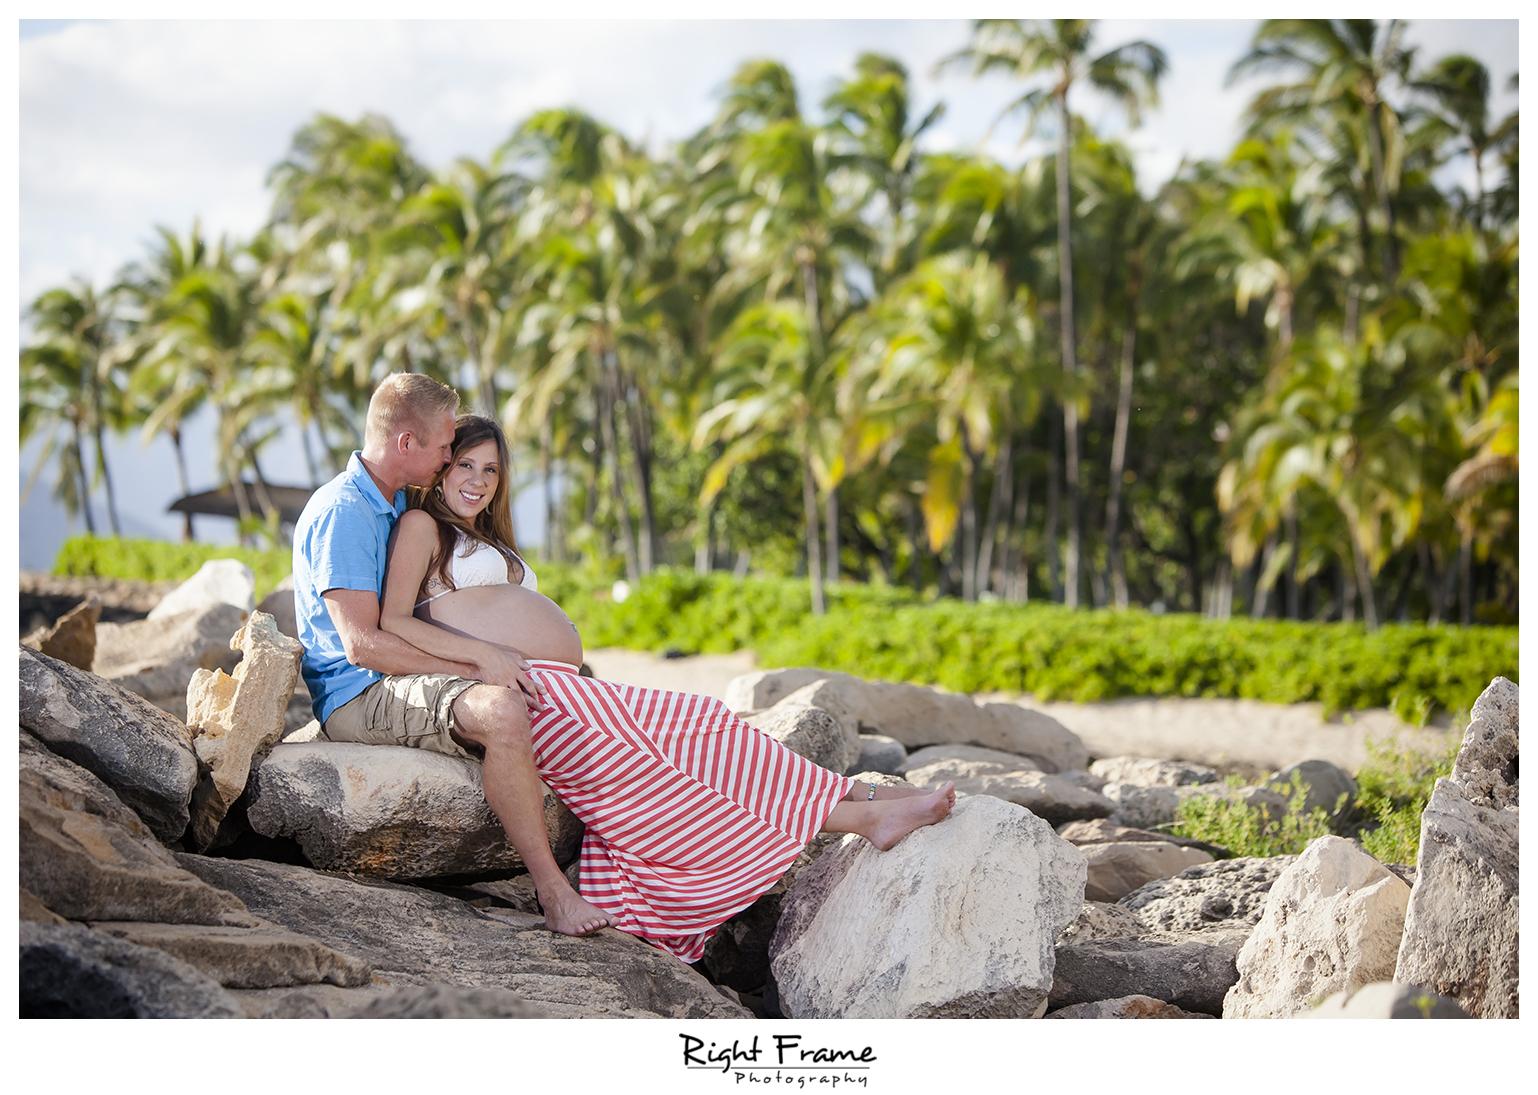 001_Honolulu_Maternity_Photography